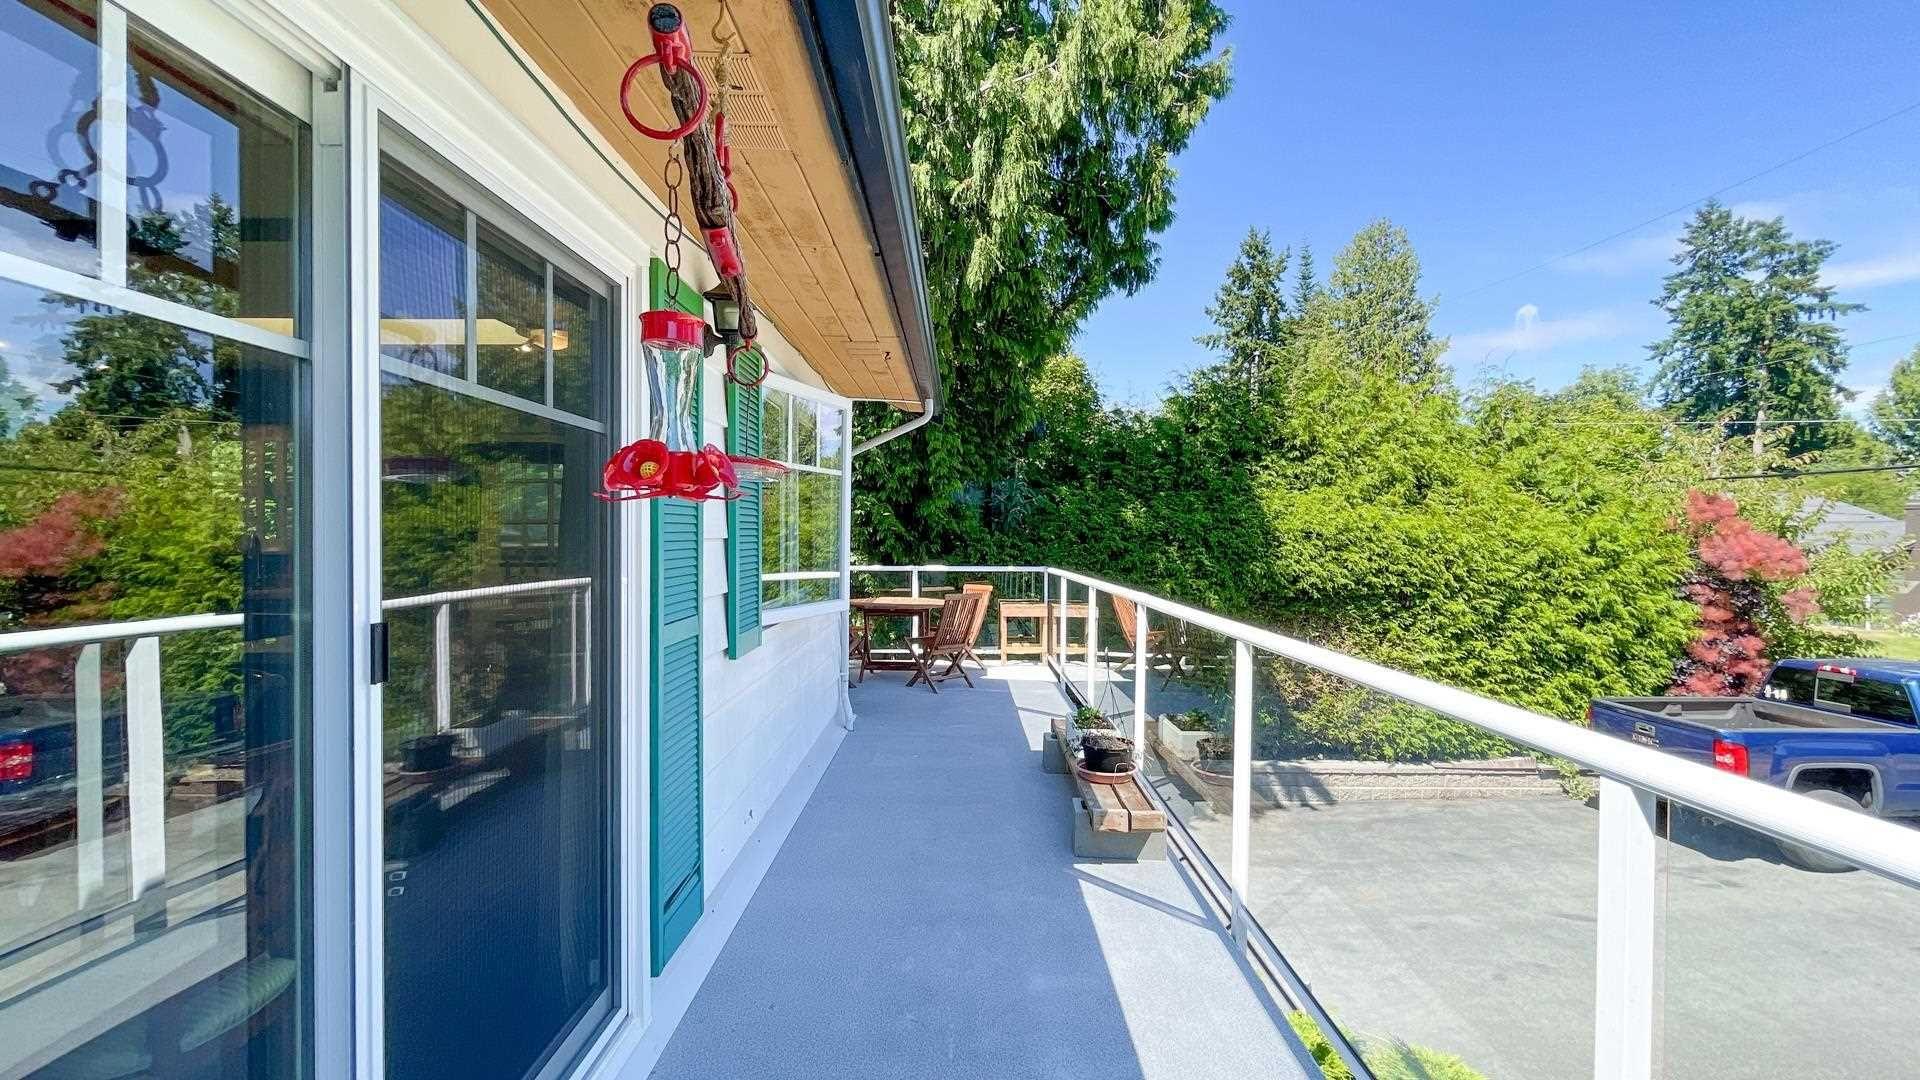 Main Photo: 1425 54 Street in Delta: Cliff Drive House for sale (Tsawwassen)  : MLS®# R2603178